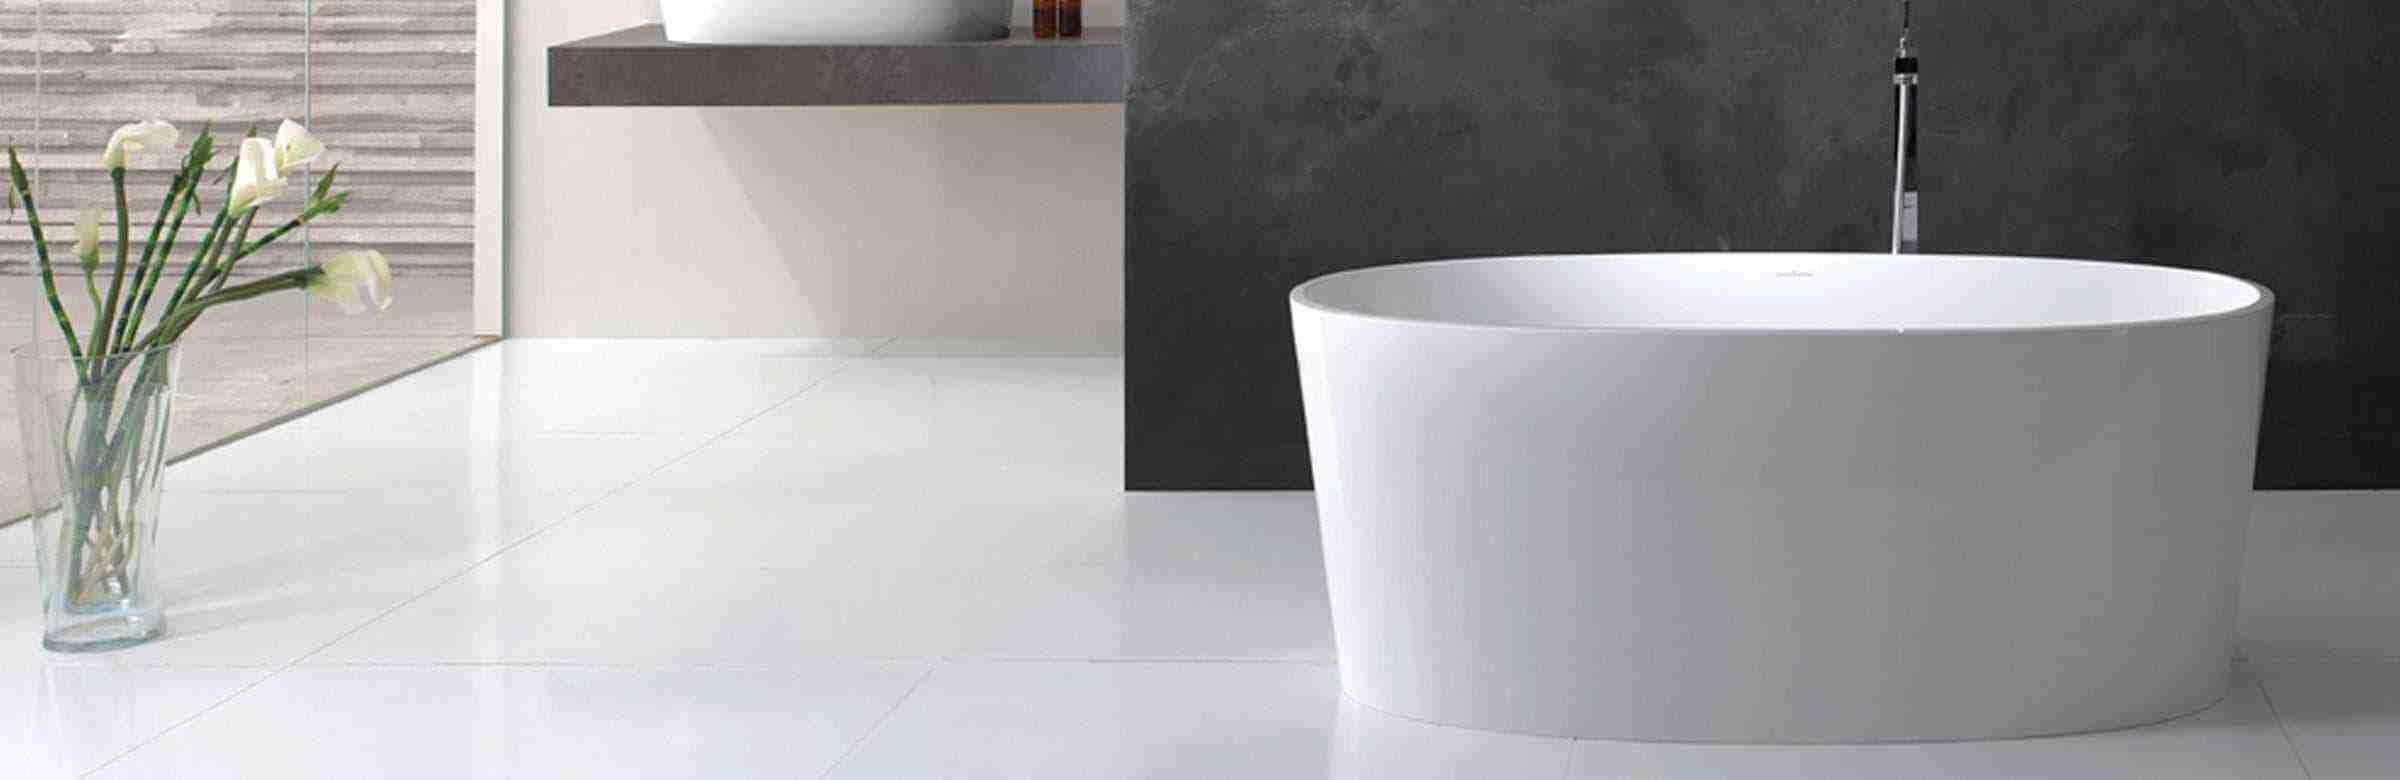 Charming The Whirlpool Bath Shop Ideas - The Best Bathroom Ideas ...